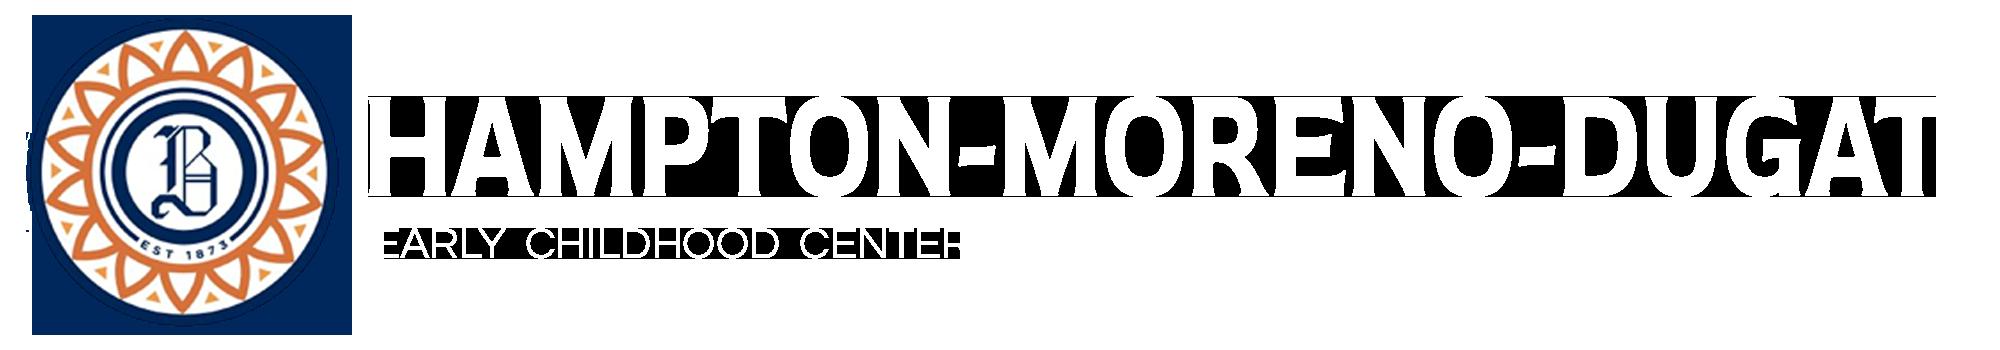 Hampton-Moreno-Dugat Early Childhood Center Logo